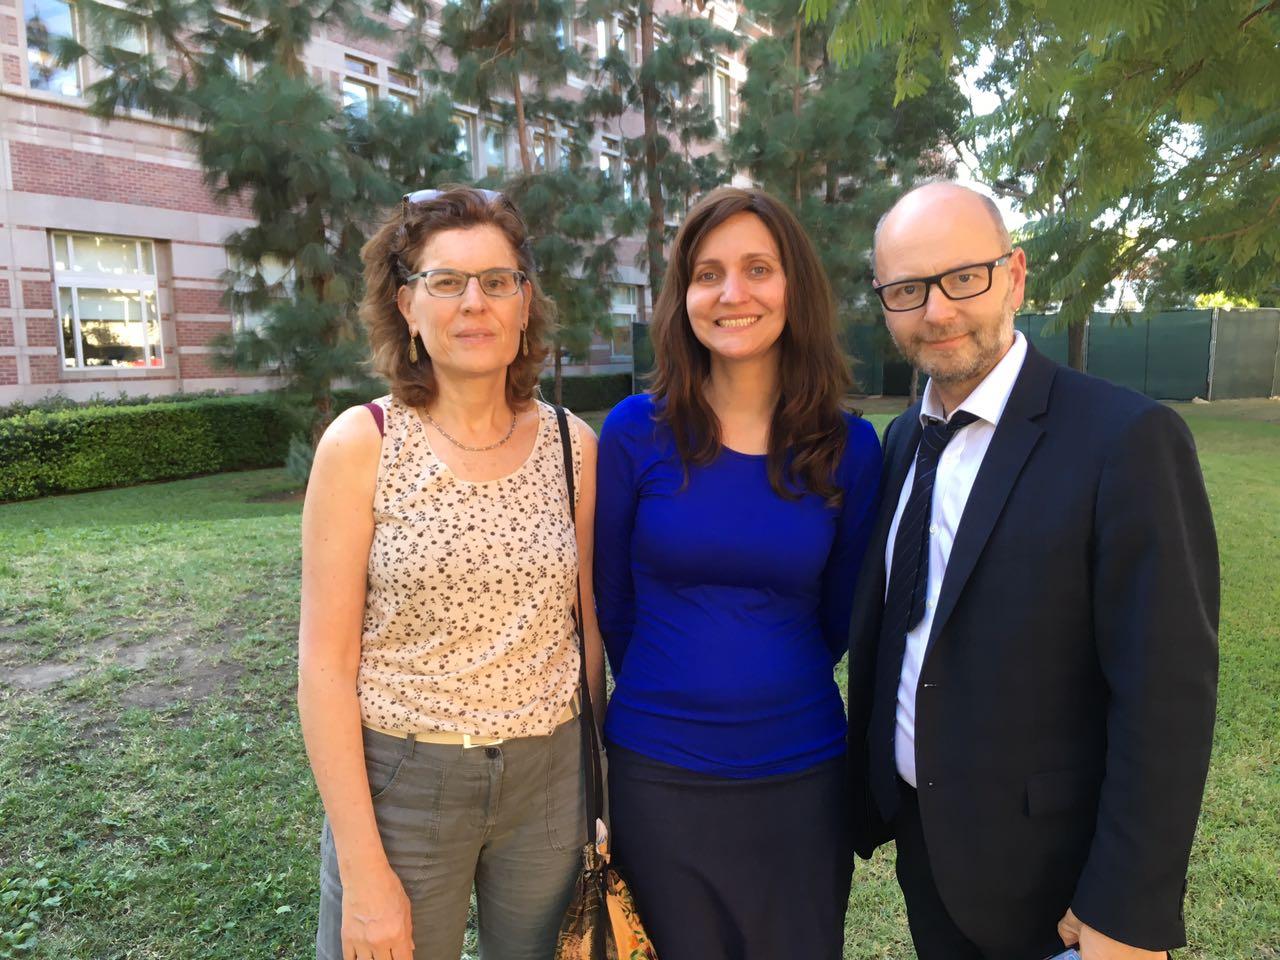 Deby Roitman, Michelle Reich and Stephen Smith